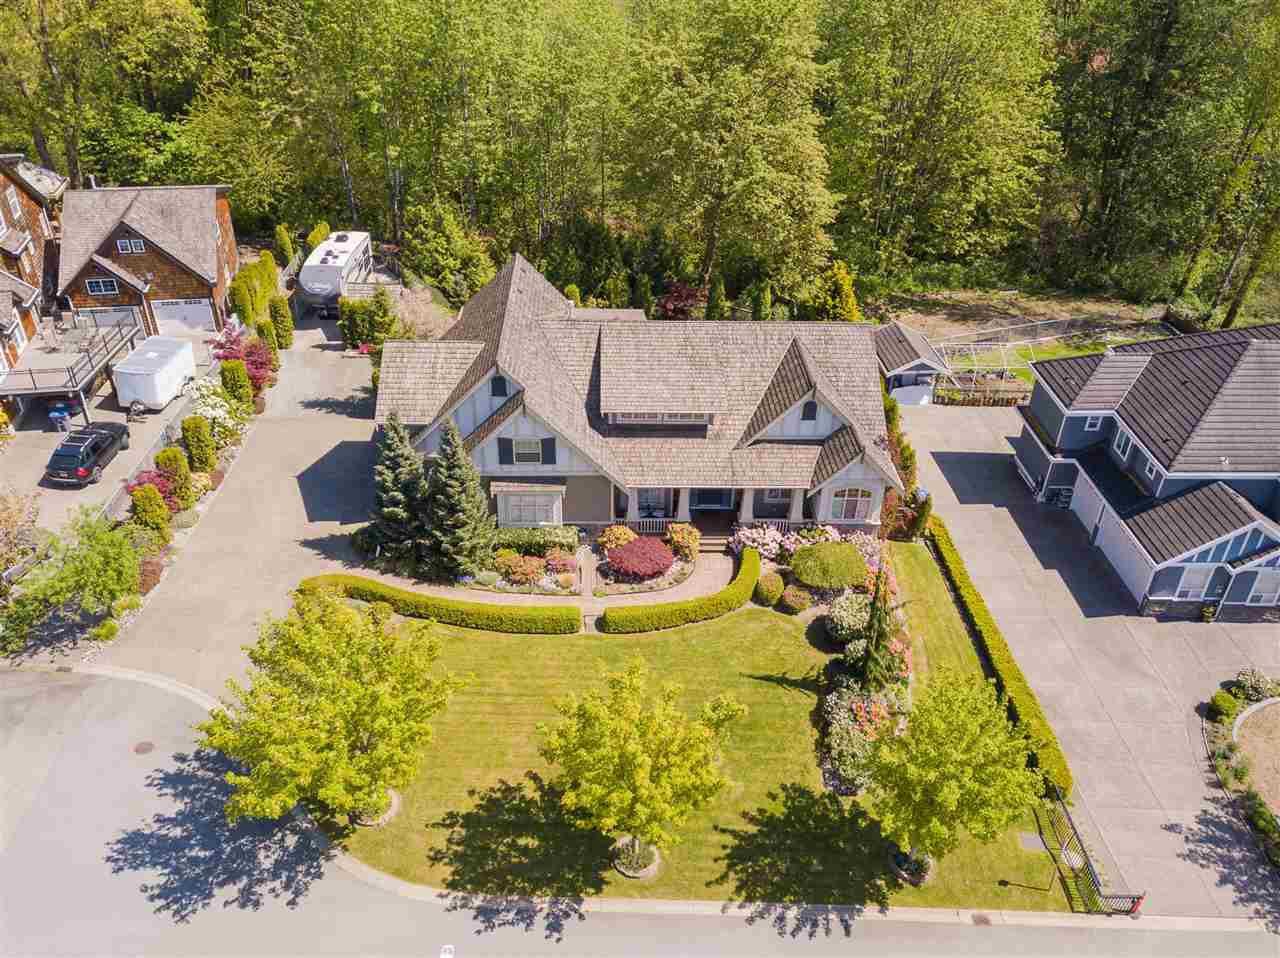 Main Photo: 7682 161 Street in Surrey: Fleetwood Tynehead House for sale : MLS®# R2385013